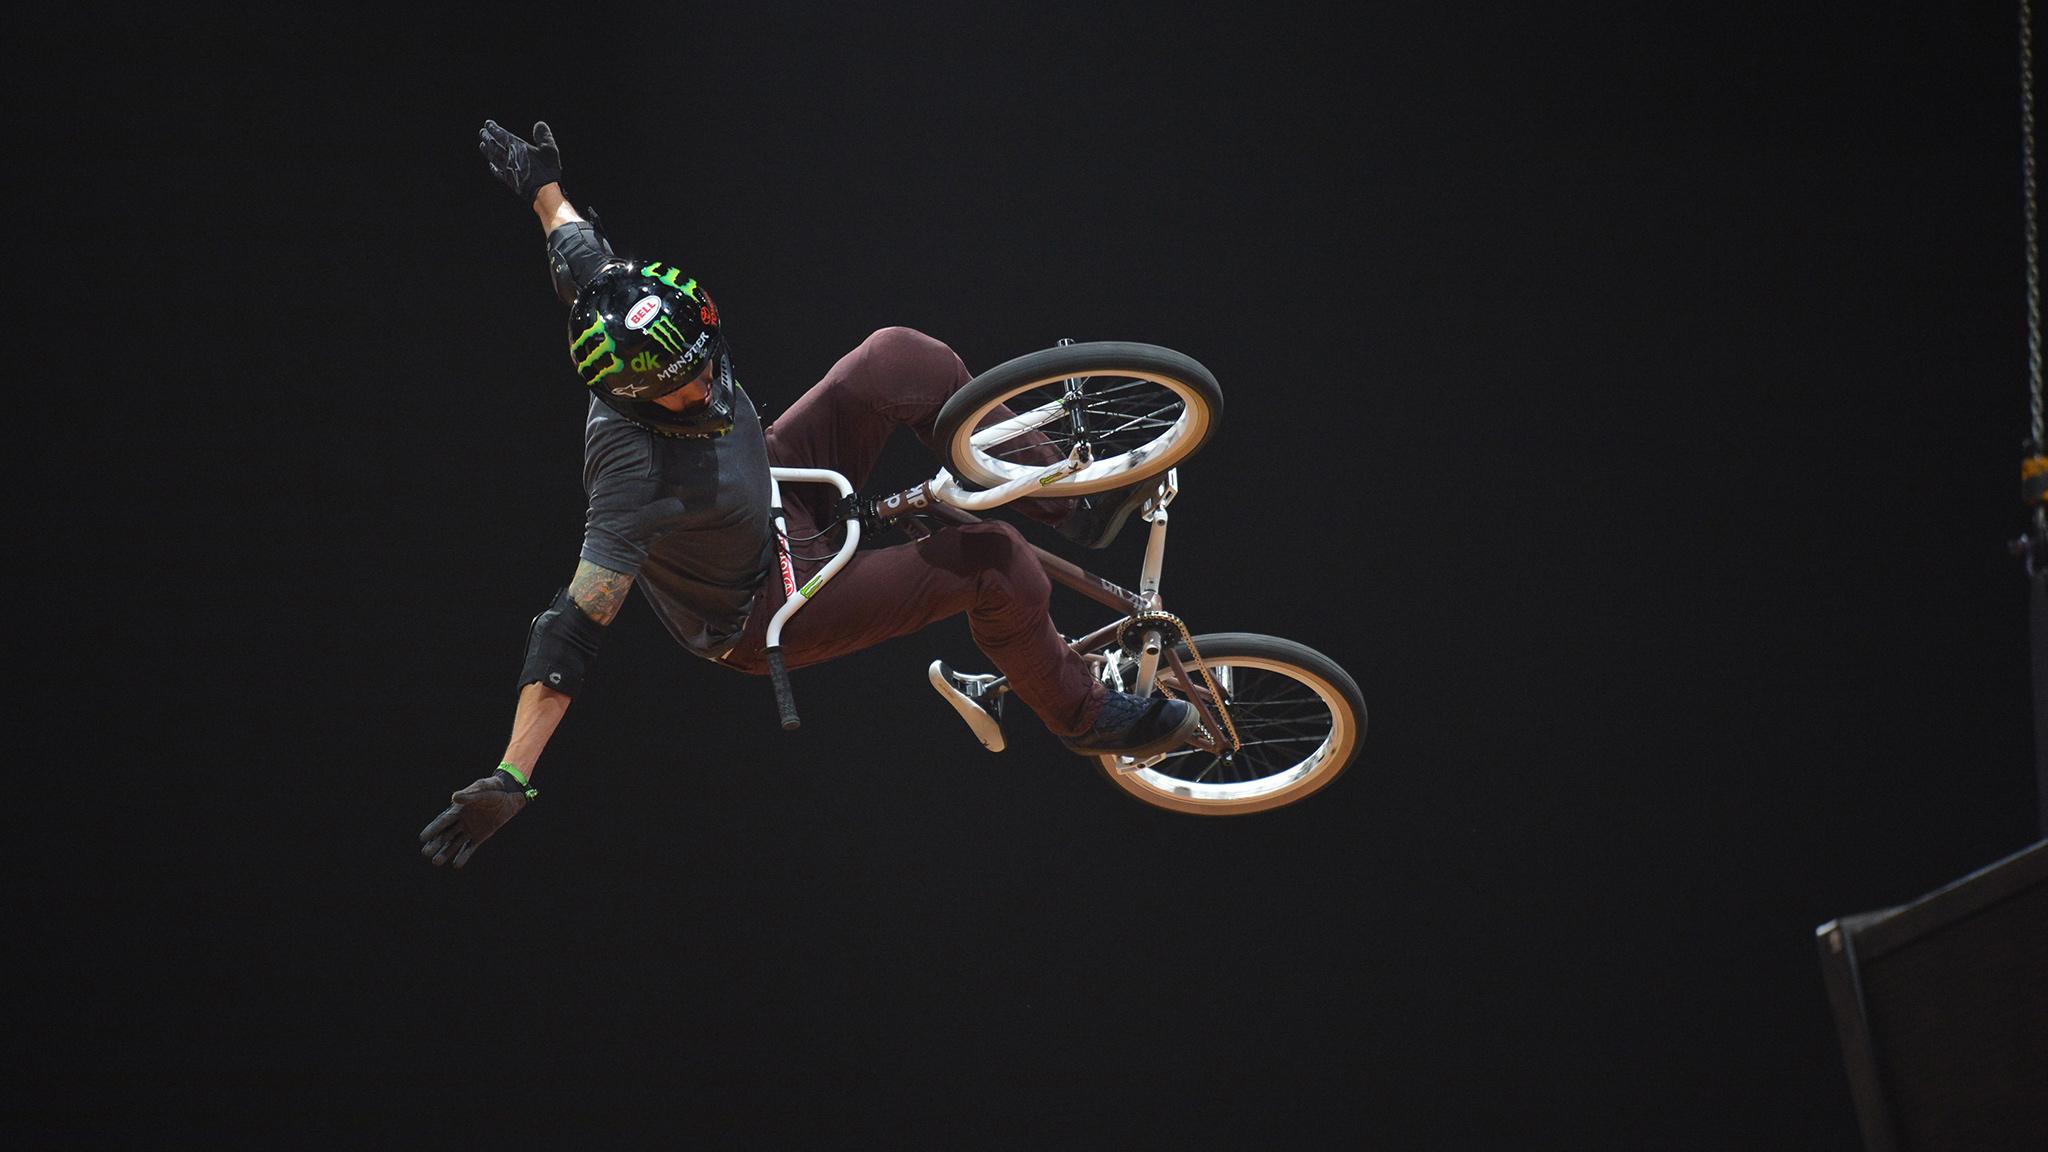 Jamie Bestwick six-peat in BMX Vert